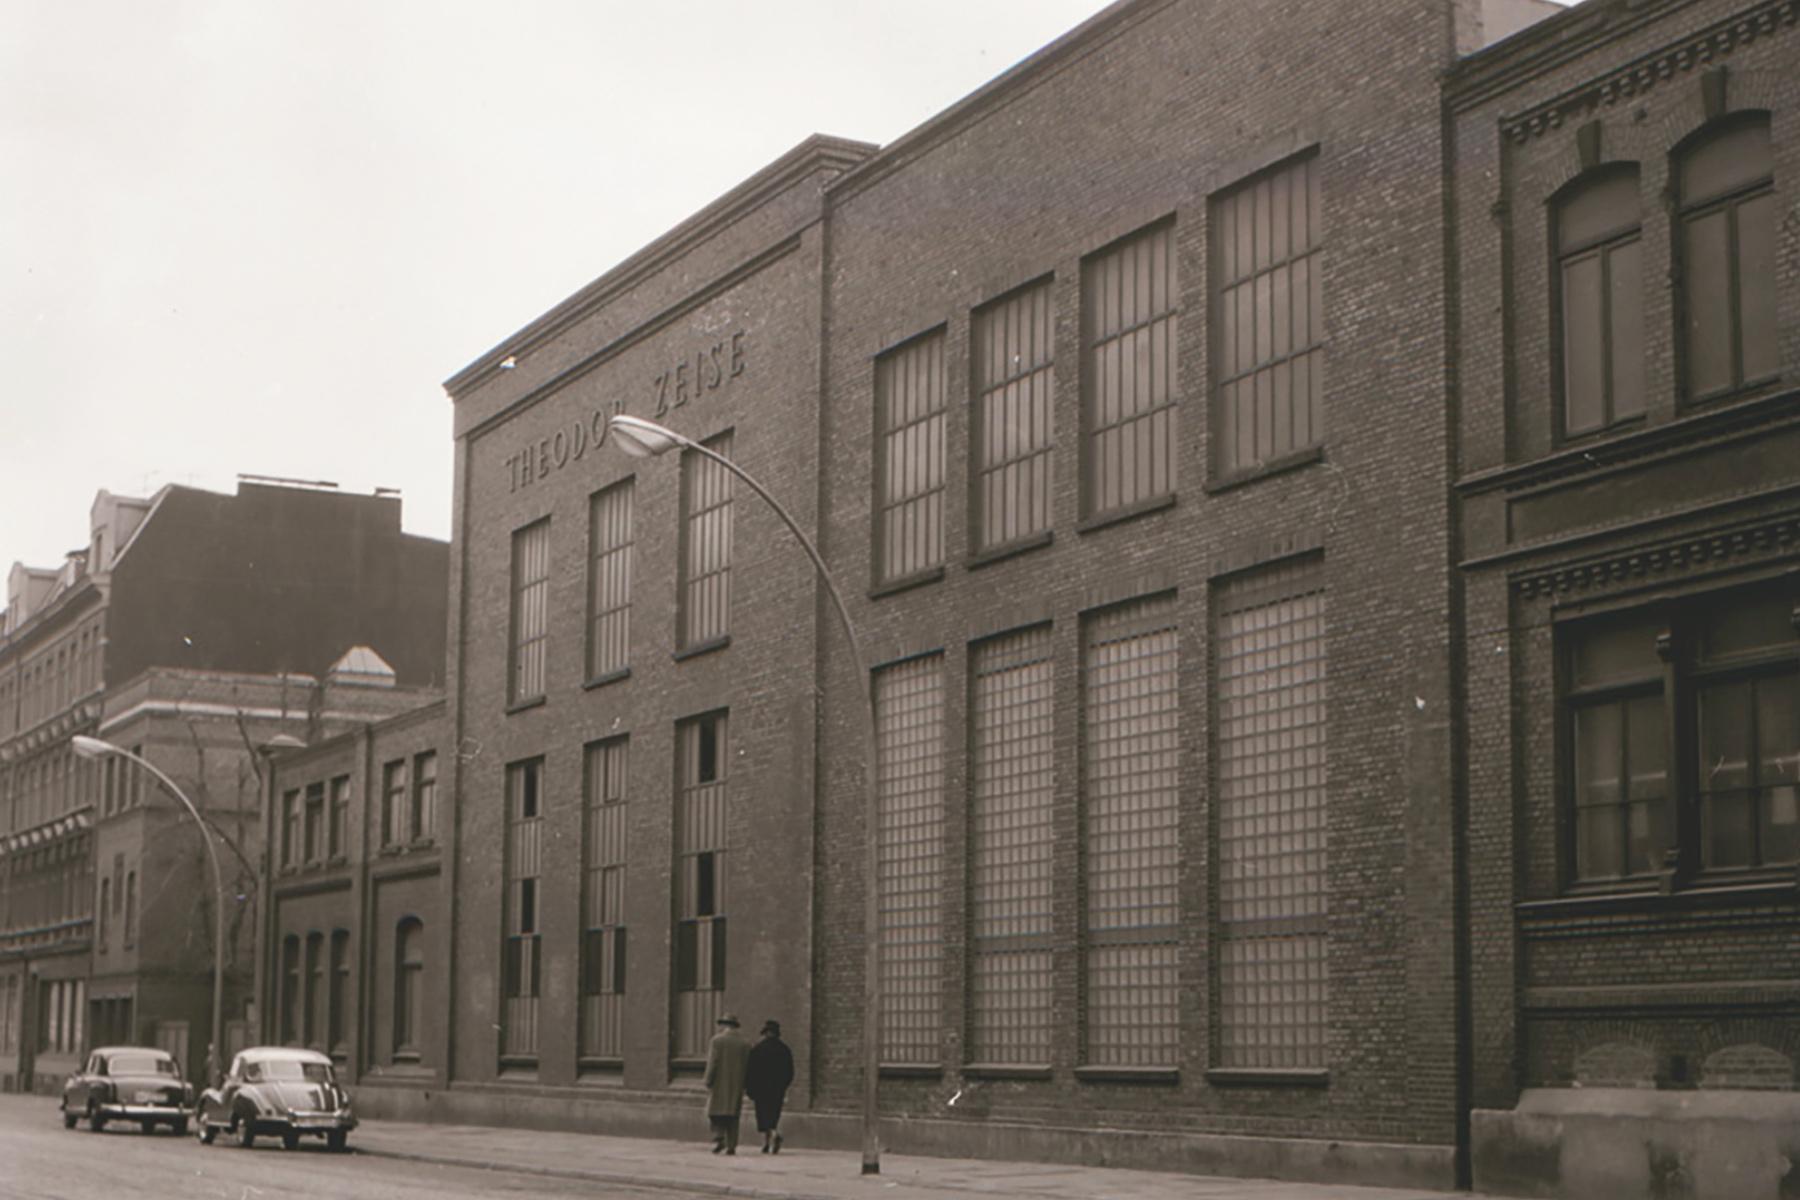 Geheimtipp Hamburg Ottensen Hometown History Altona SHMH 02 – ©SHMH